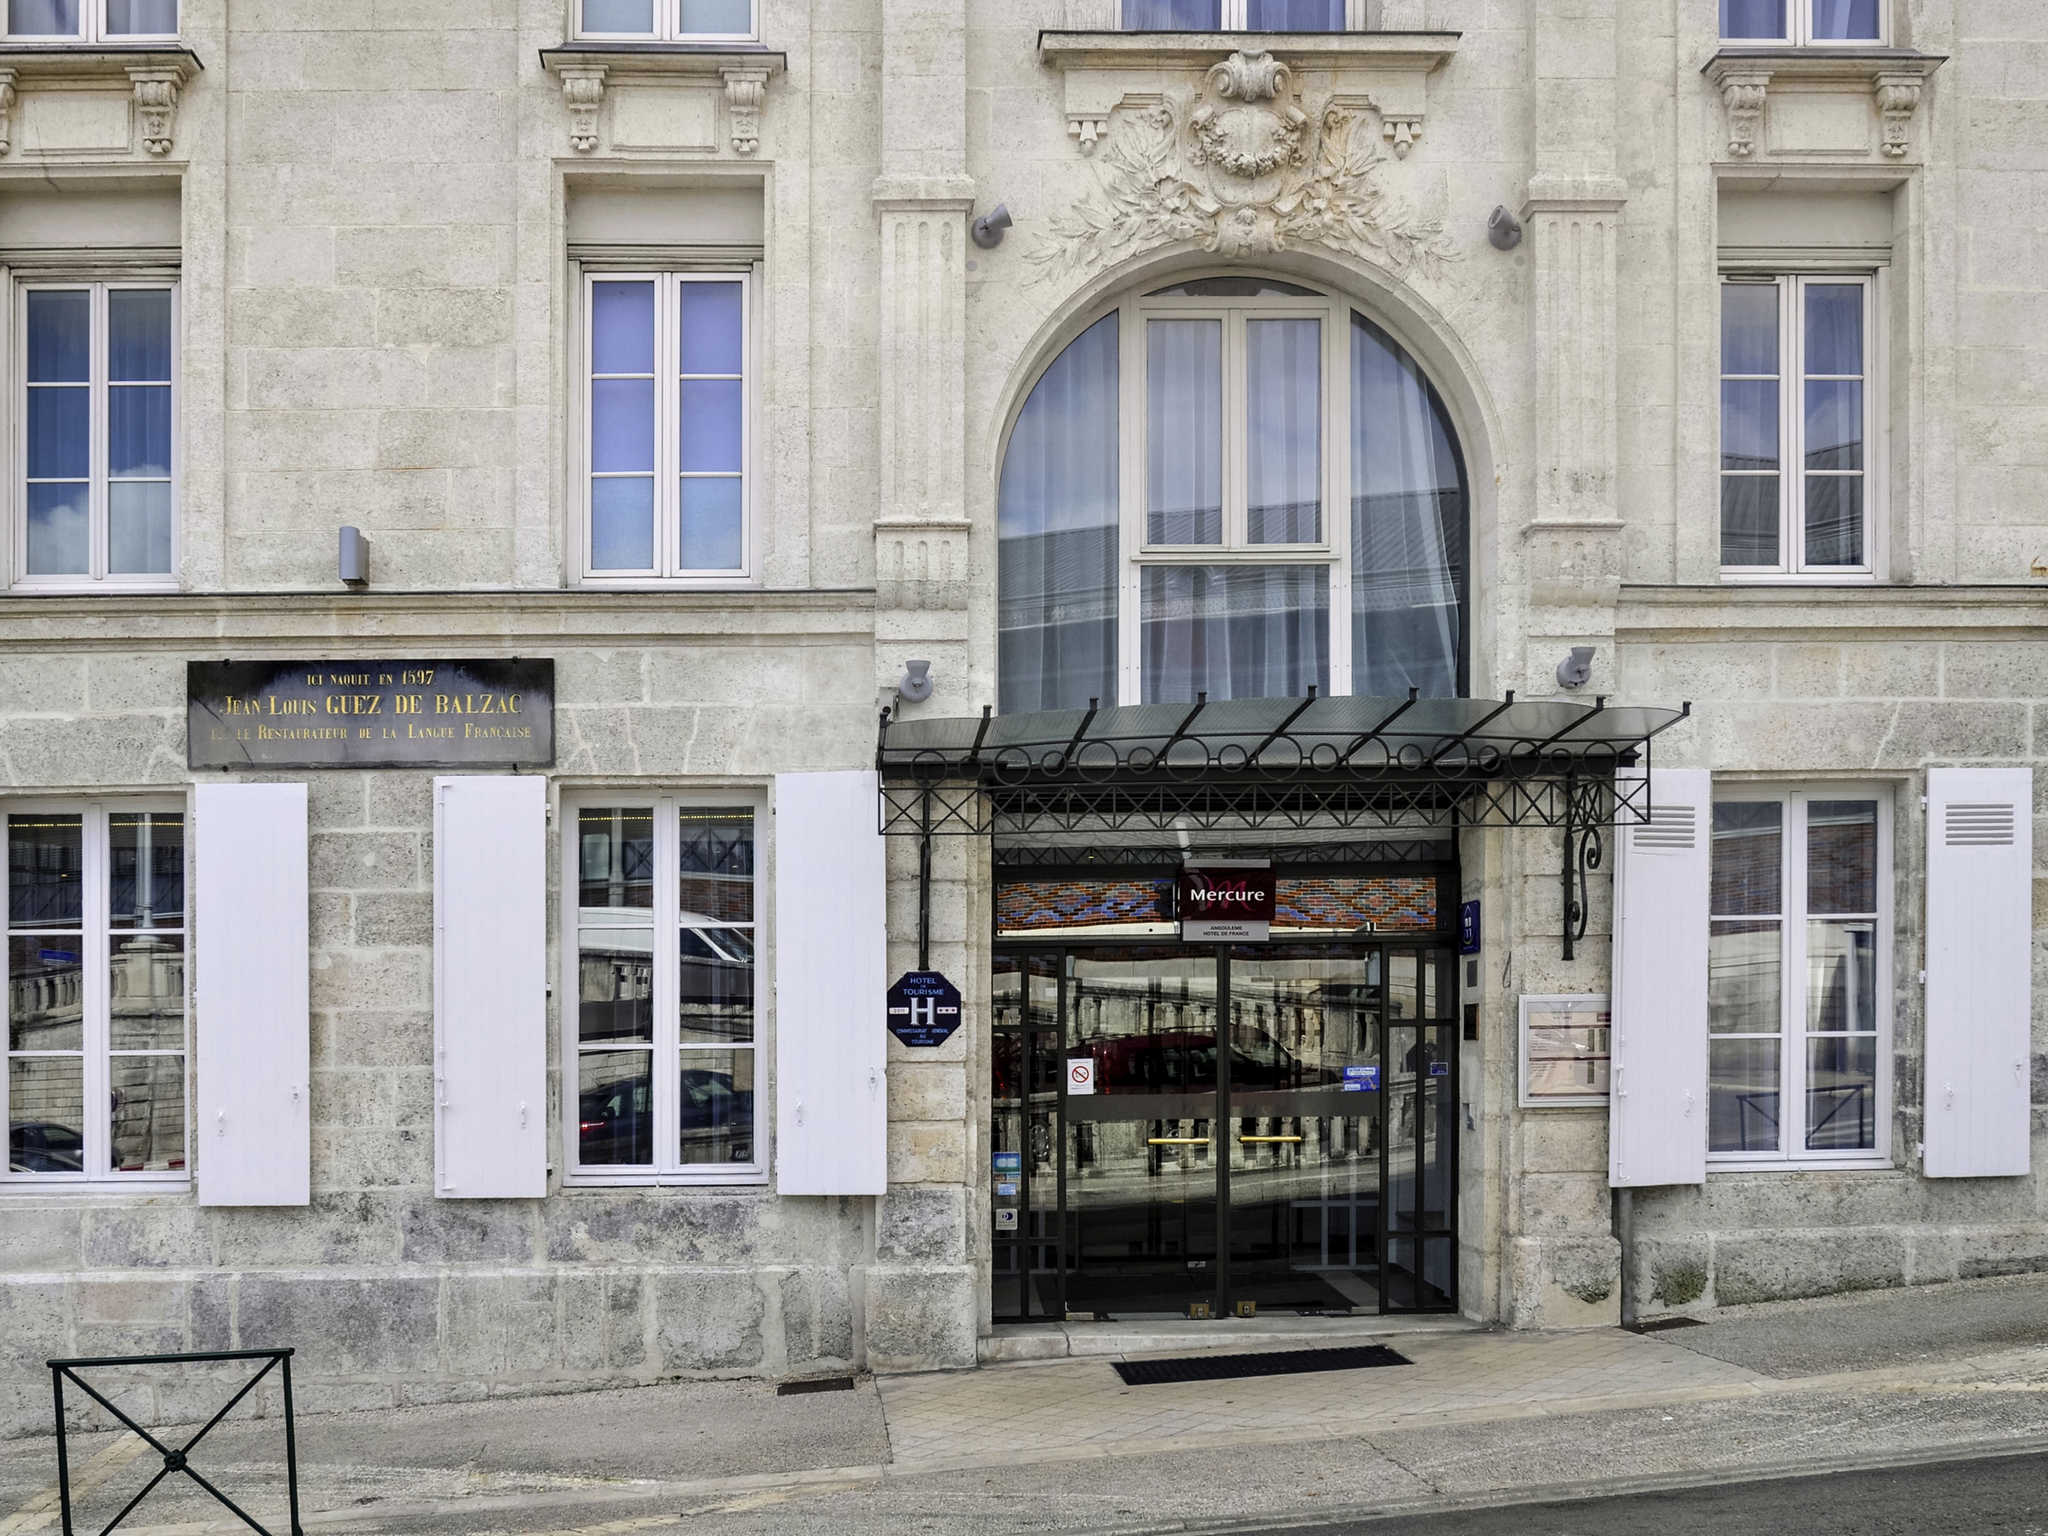 Hotel – Mercure Angouleme Hotel de France hotel